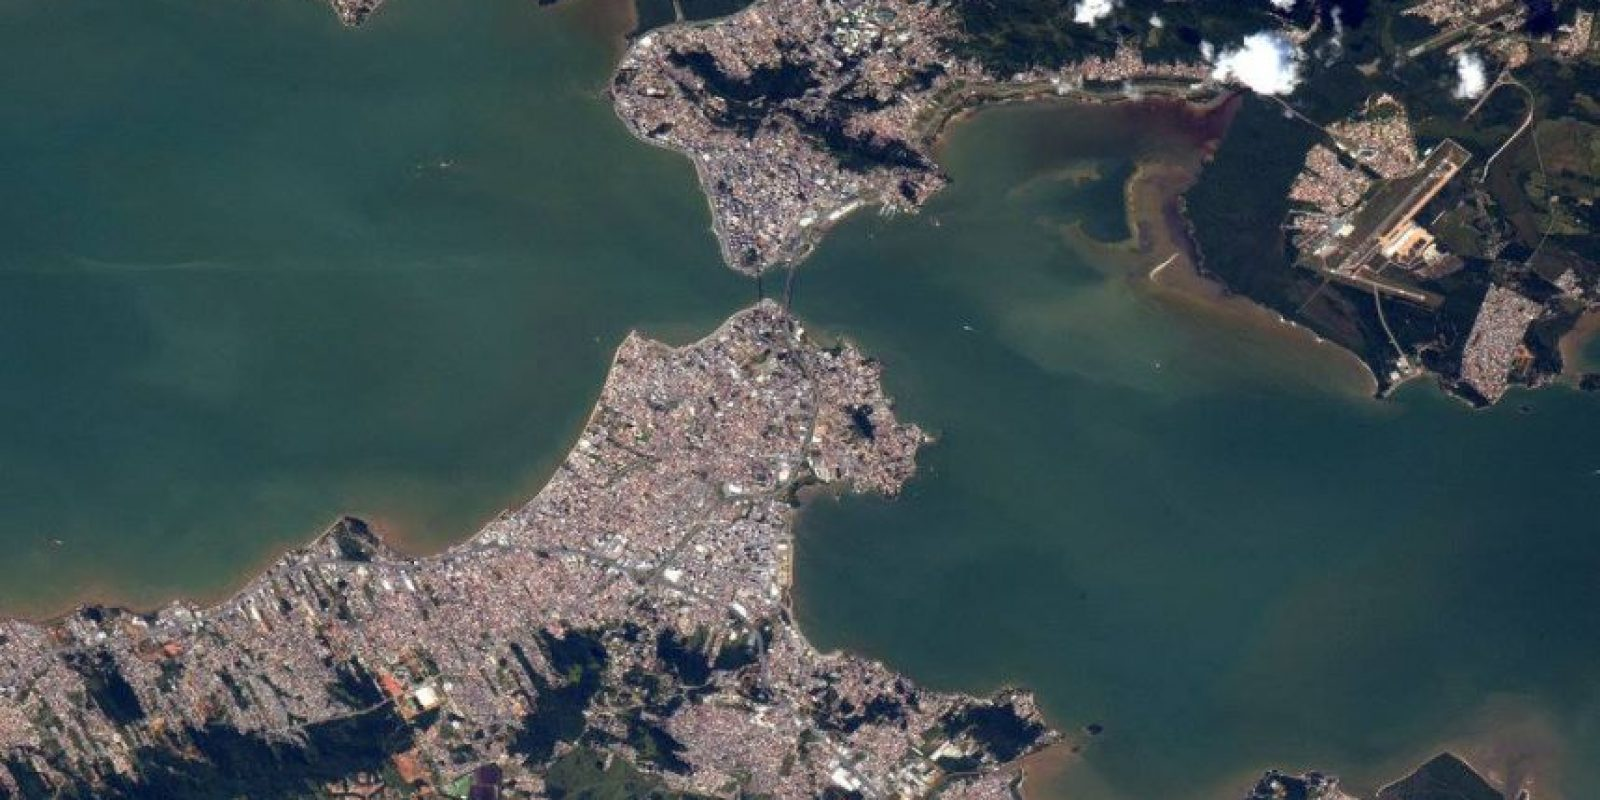 Y así luce Río de Janeiro, en Brasil Foto:Facebook.com/pages/NASA-Astronaut-Scott-Kelly